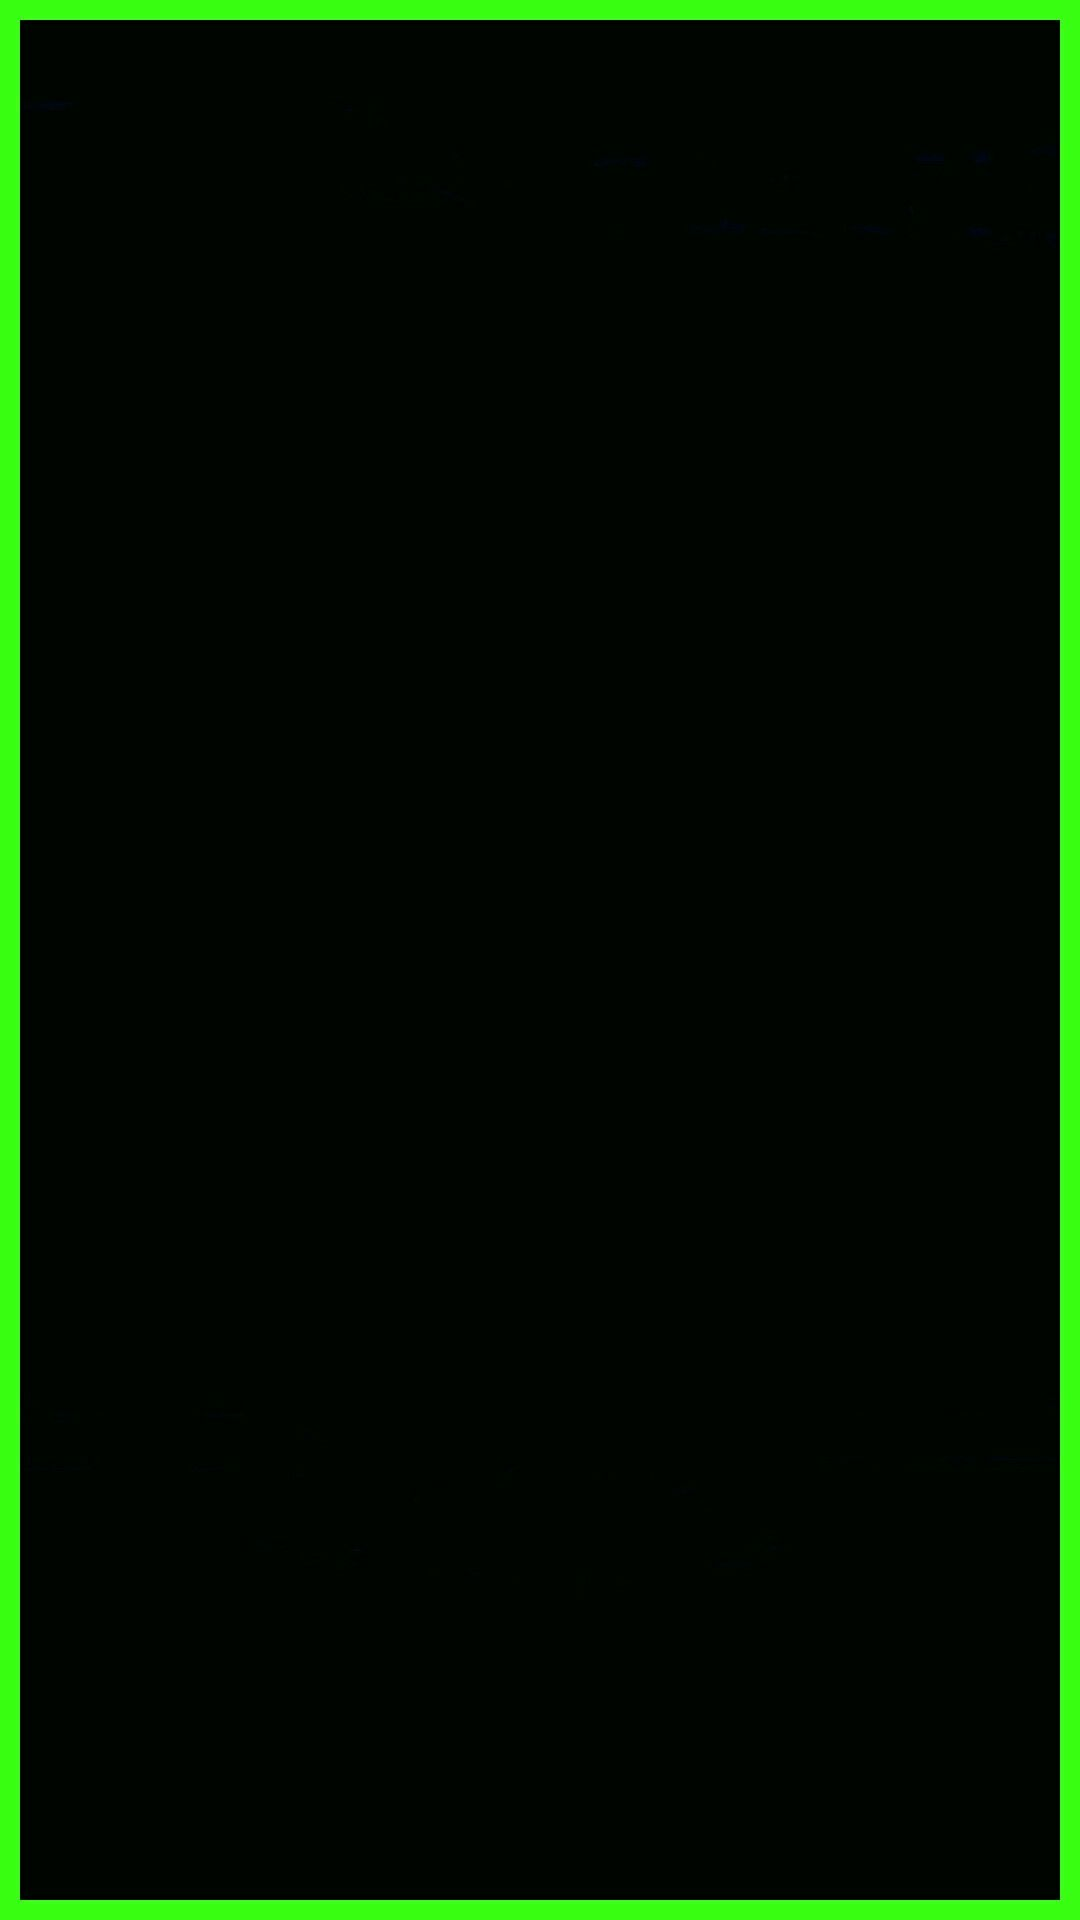 neon green border wallpaper *black wallpapersneon green border wallpaper